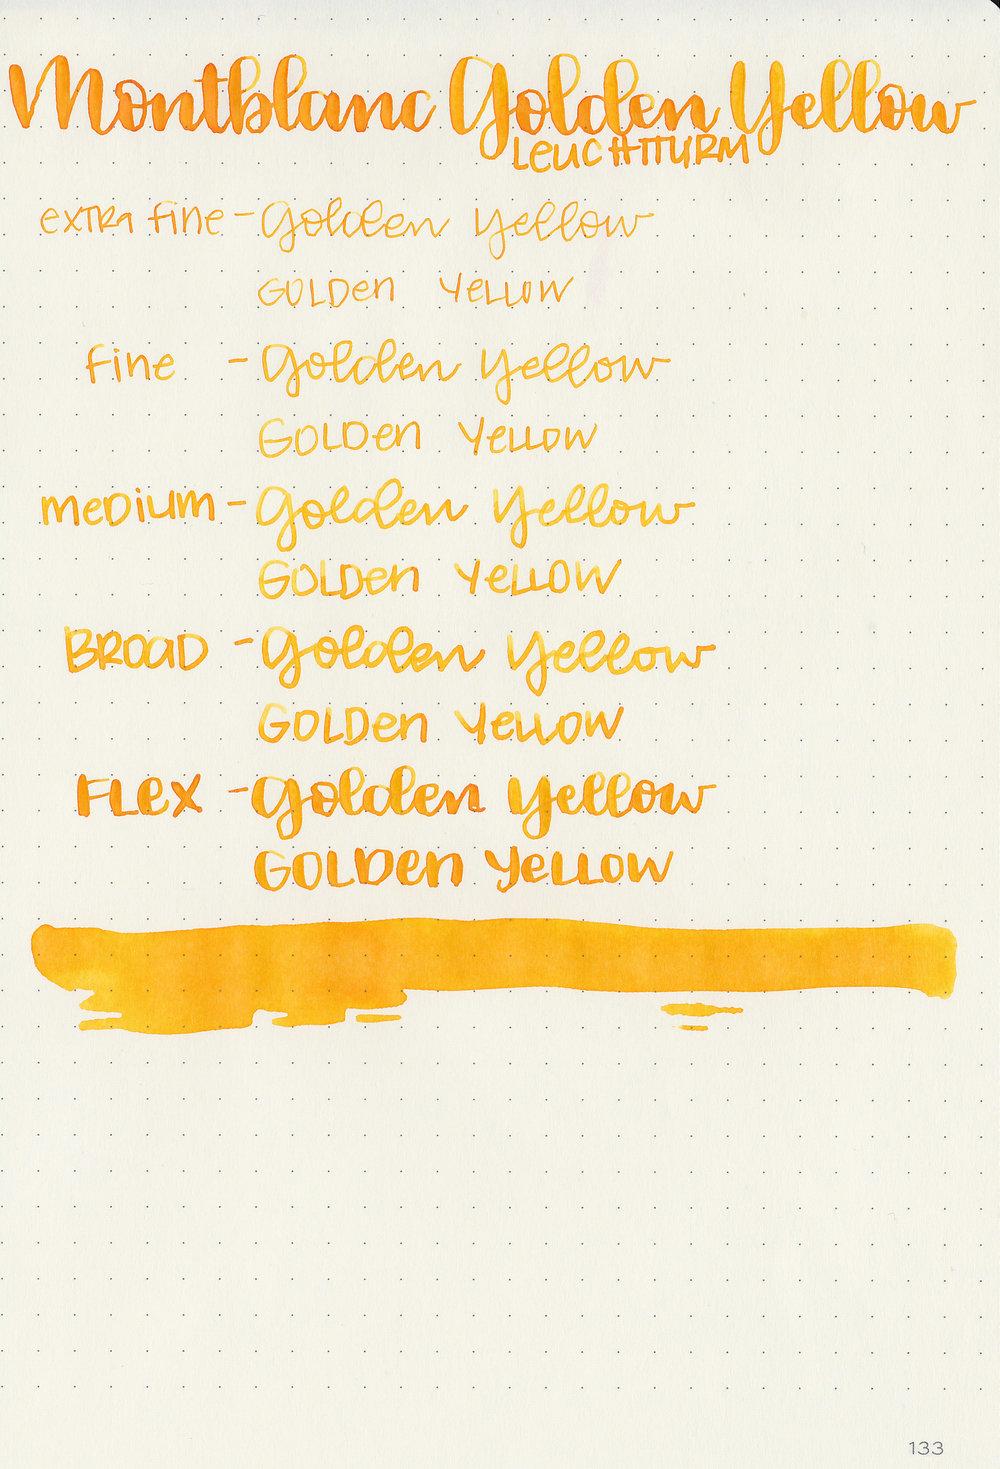 mb-golden-yellow-13.jpg